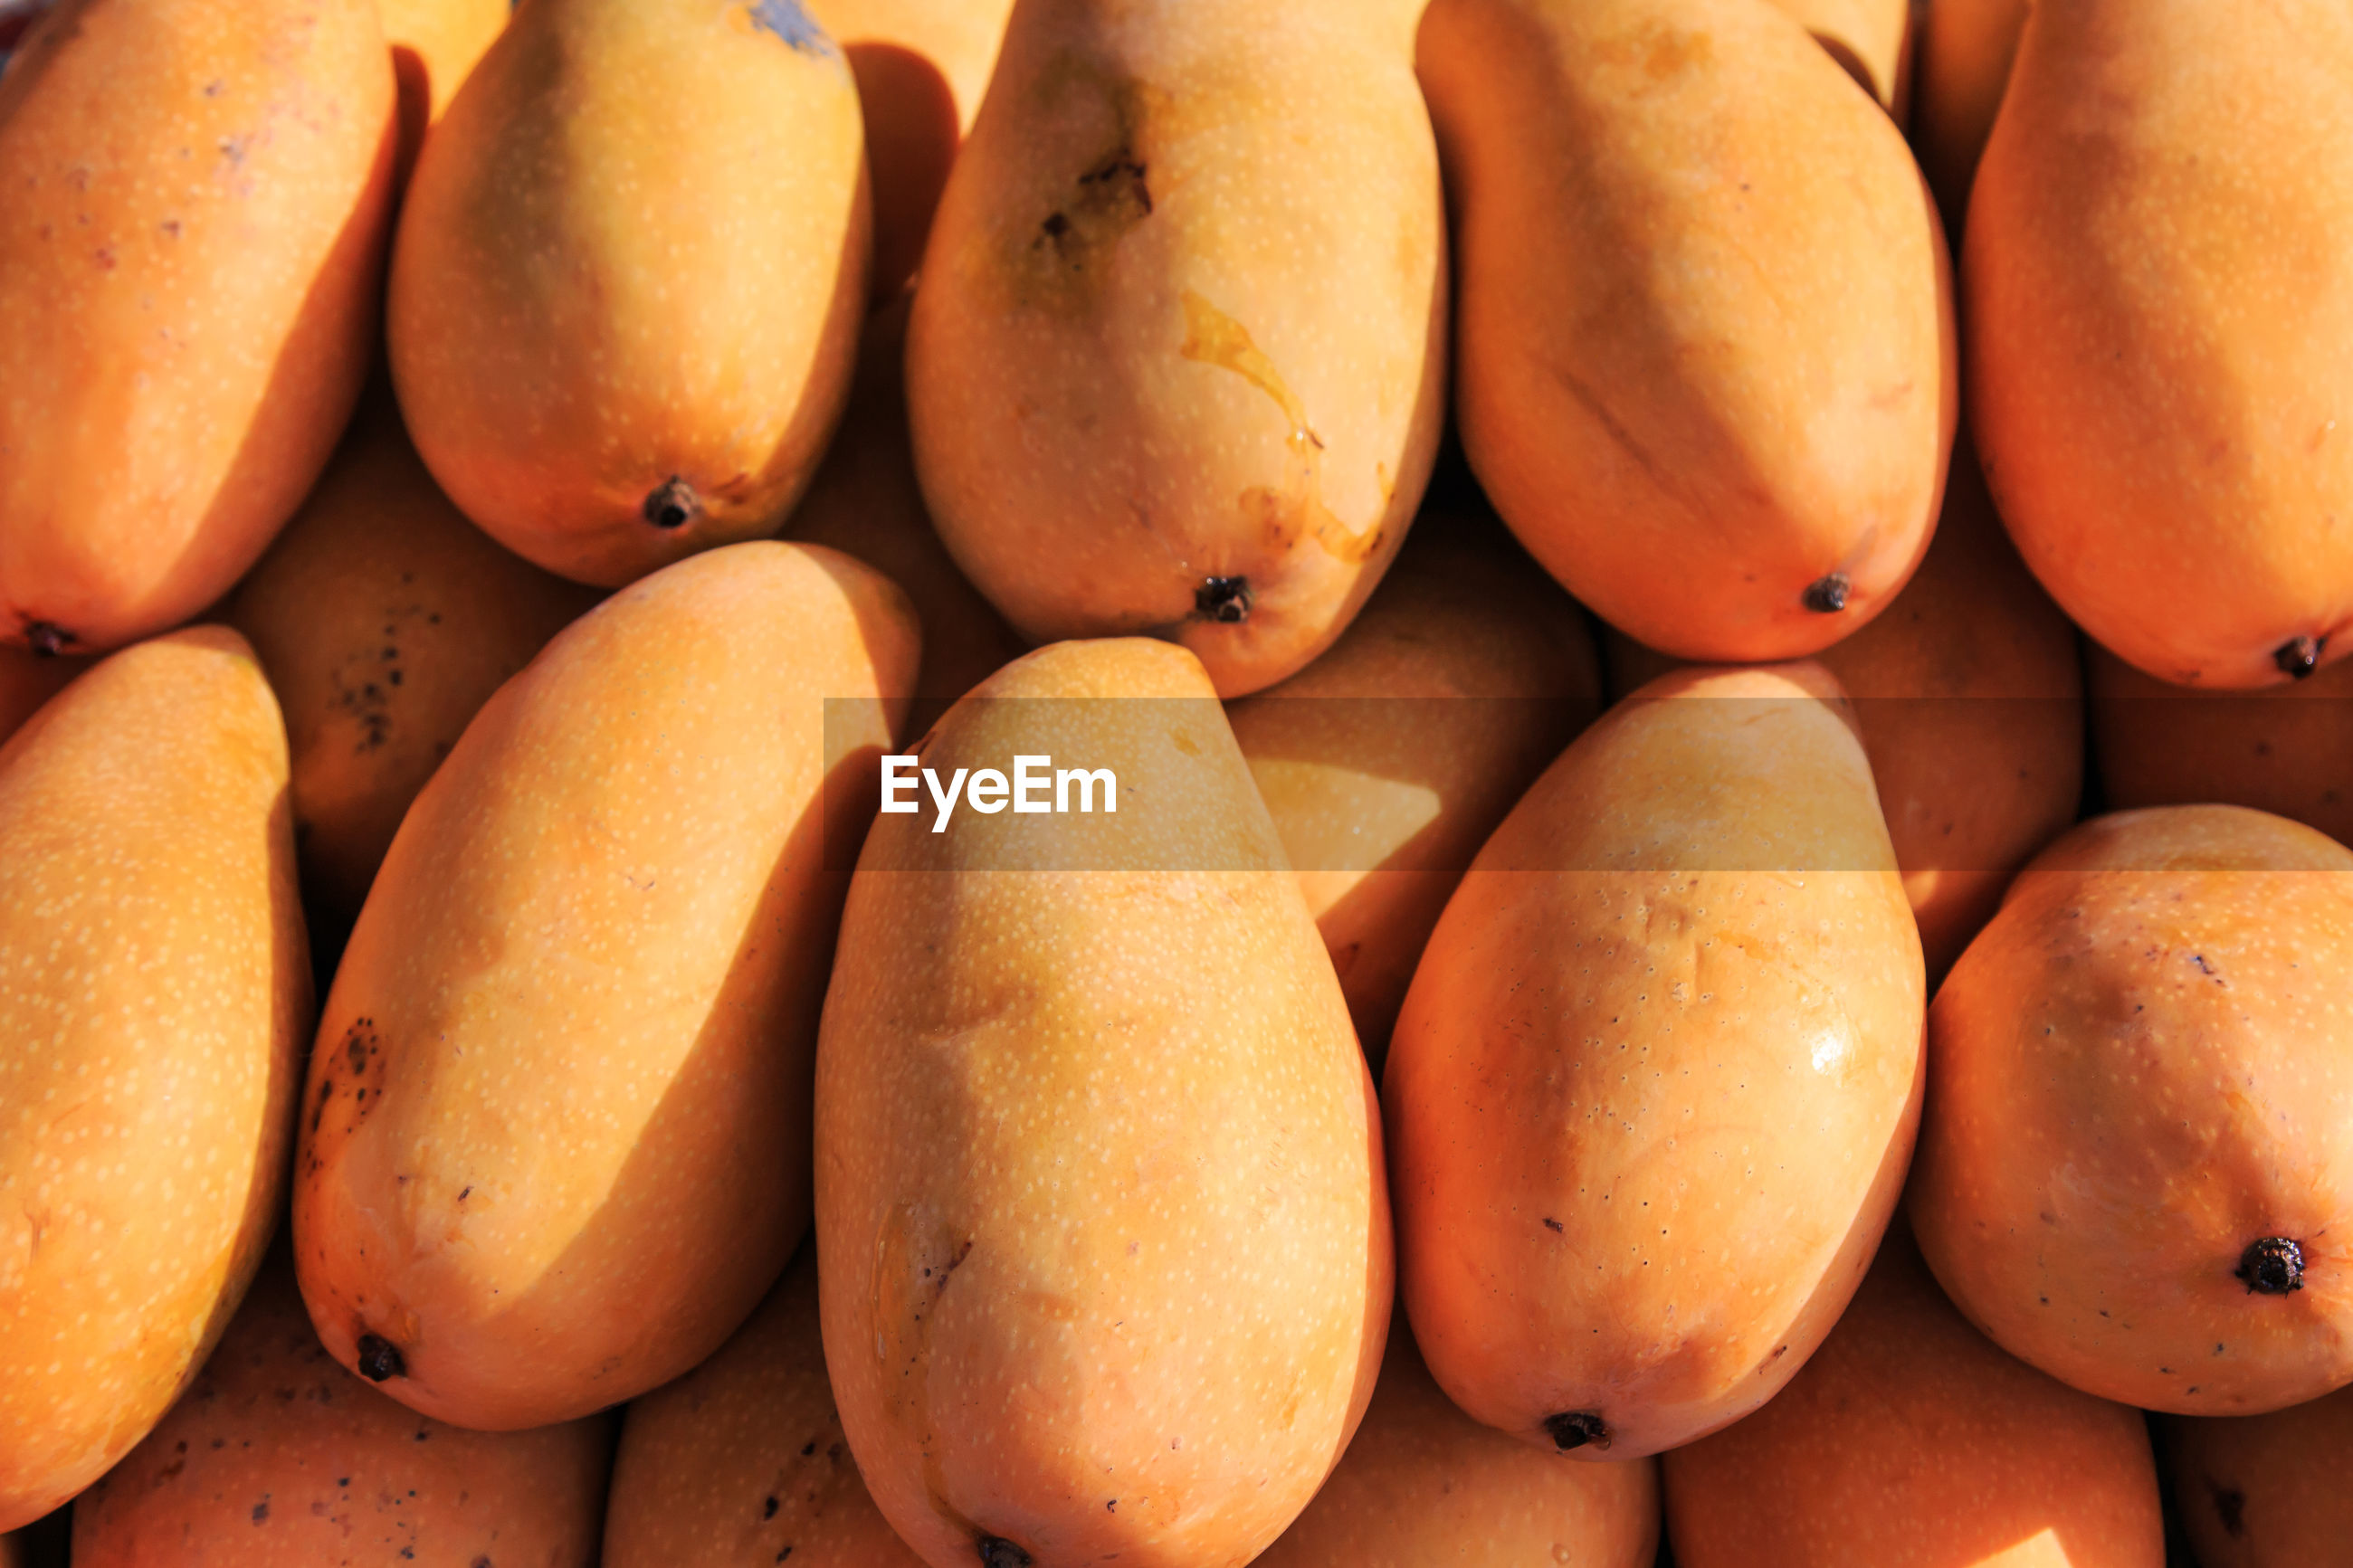 Full frame shot of mangoes for sale at market stall